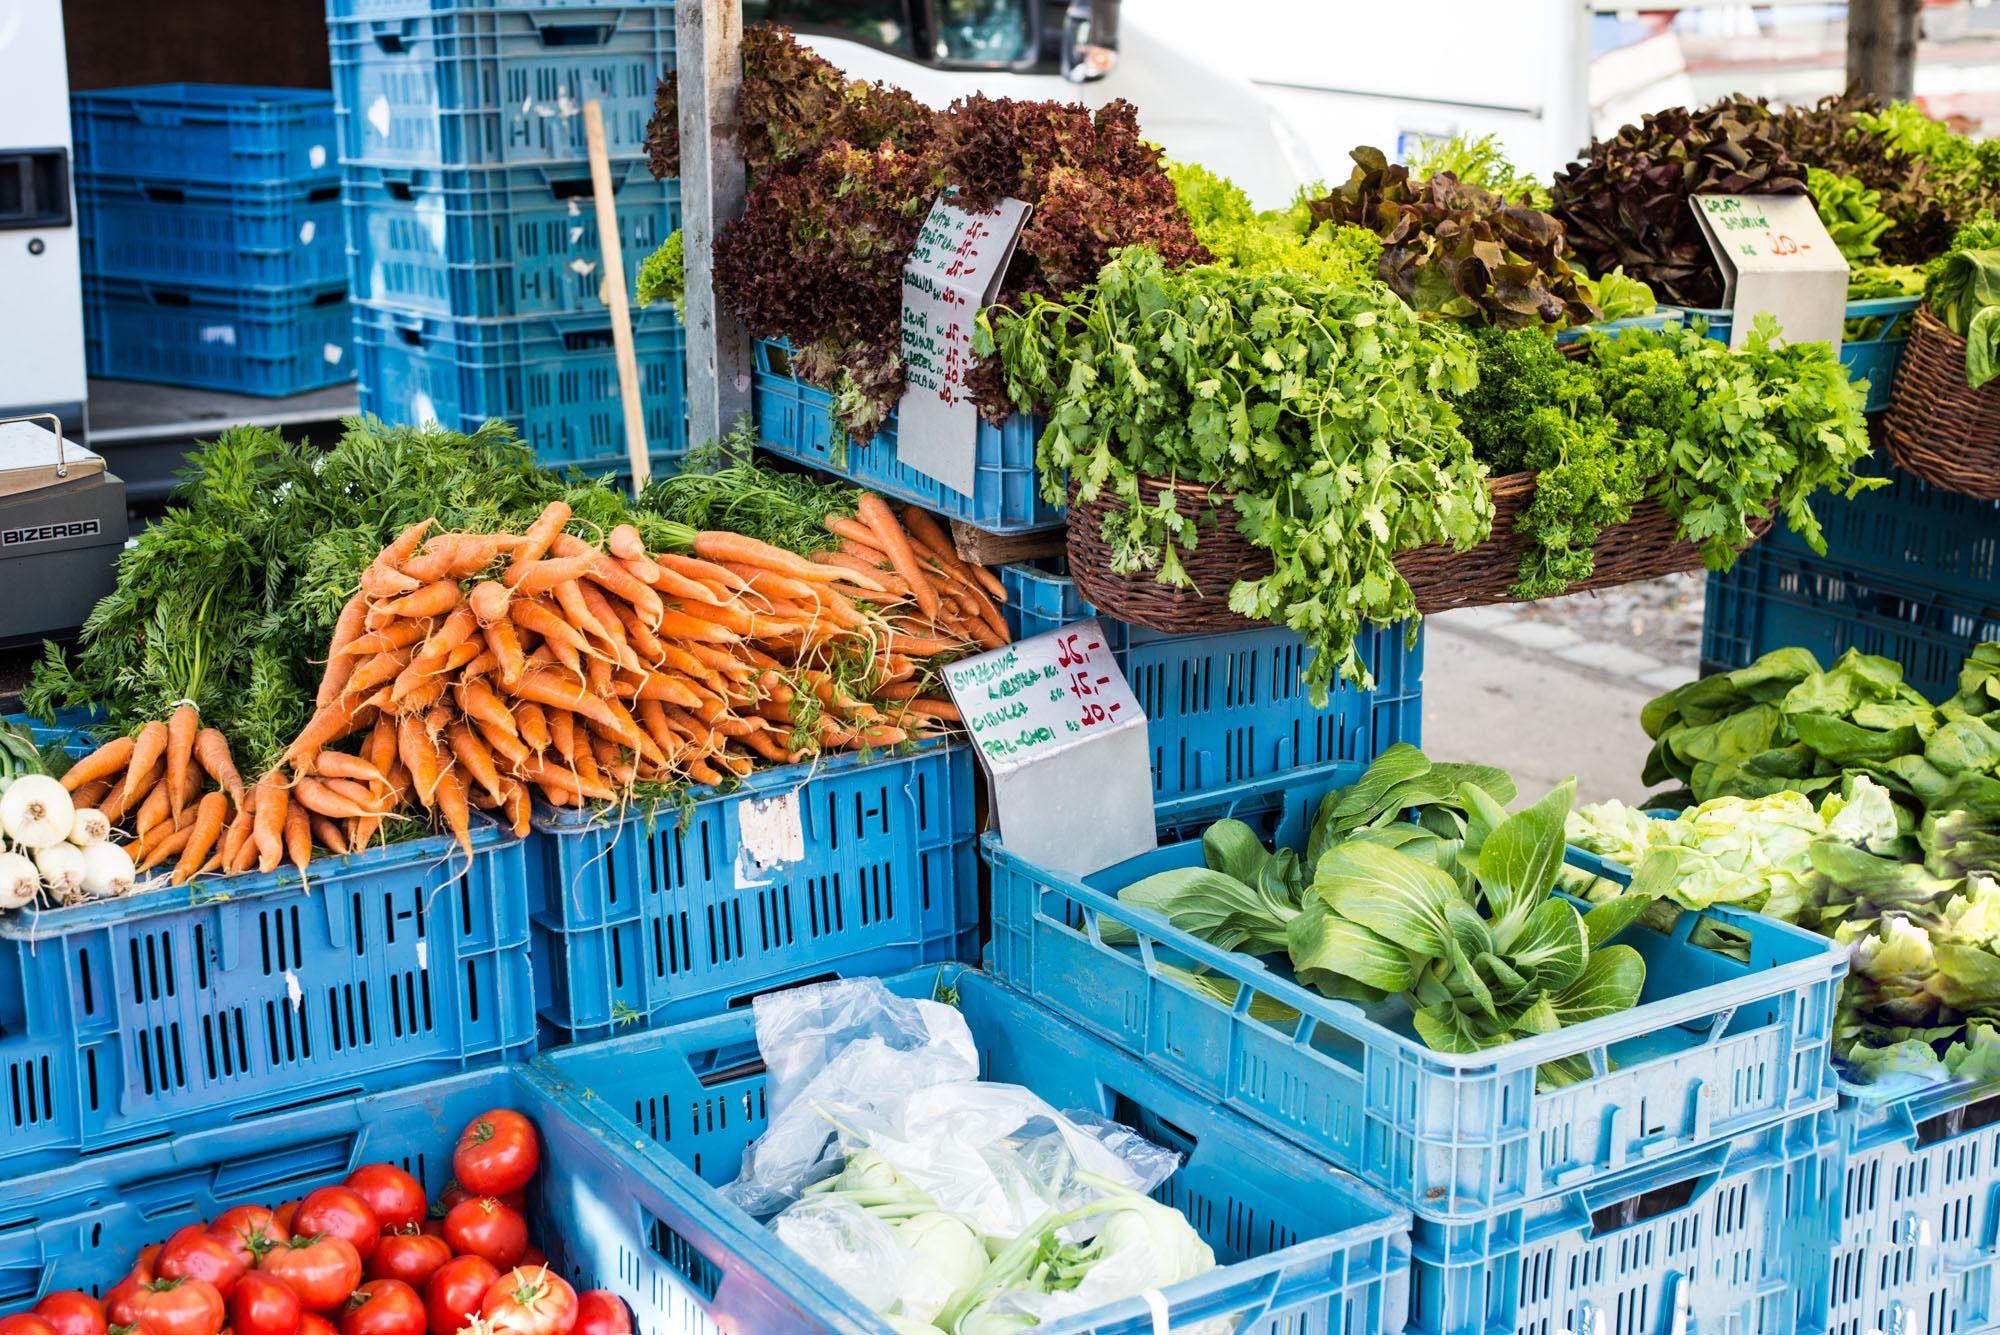 Jiriho z Podebrad farmers market prague